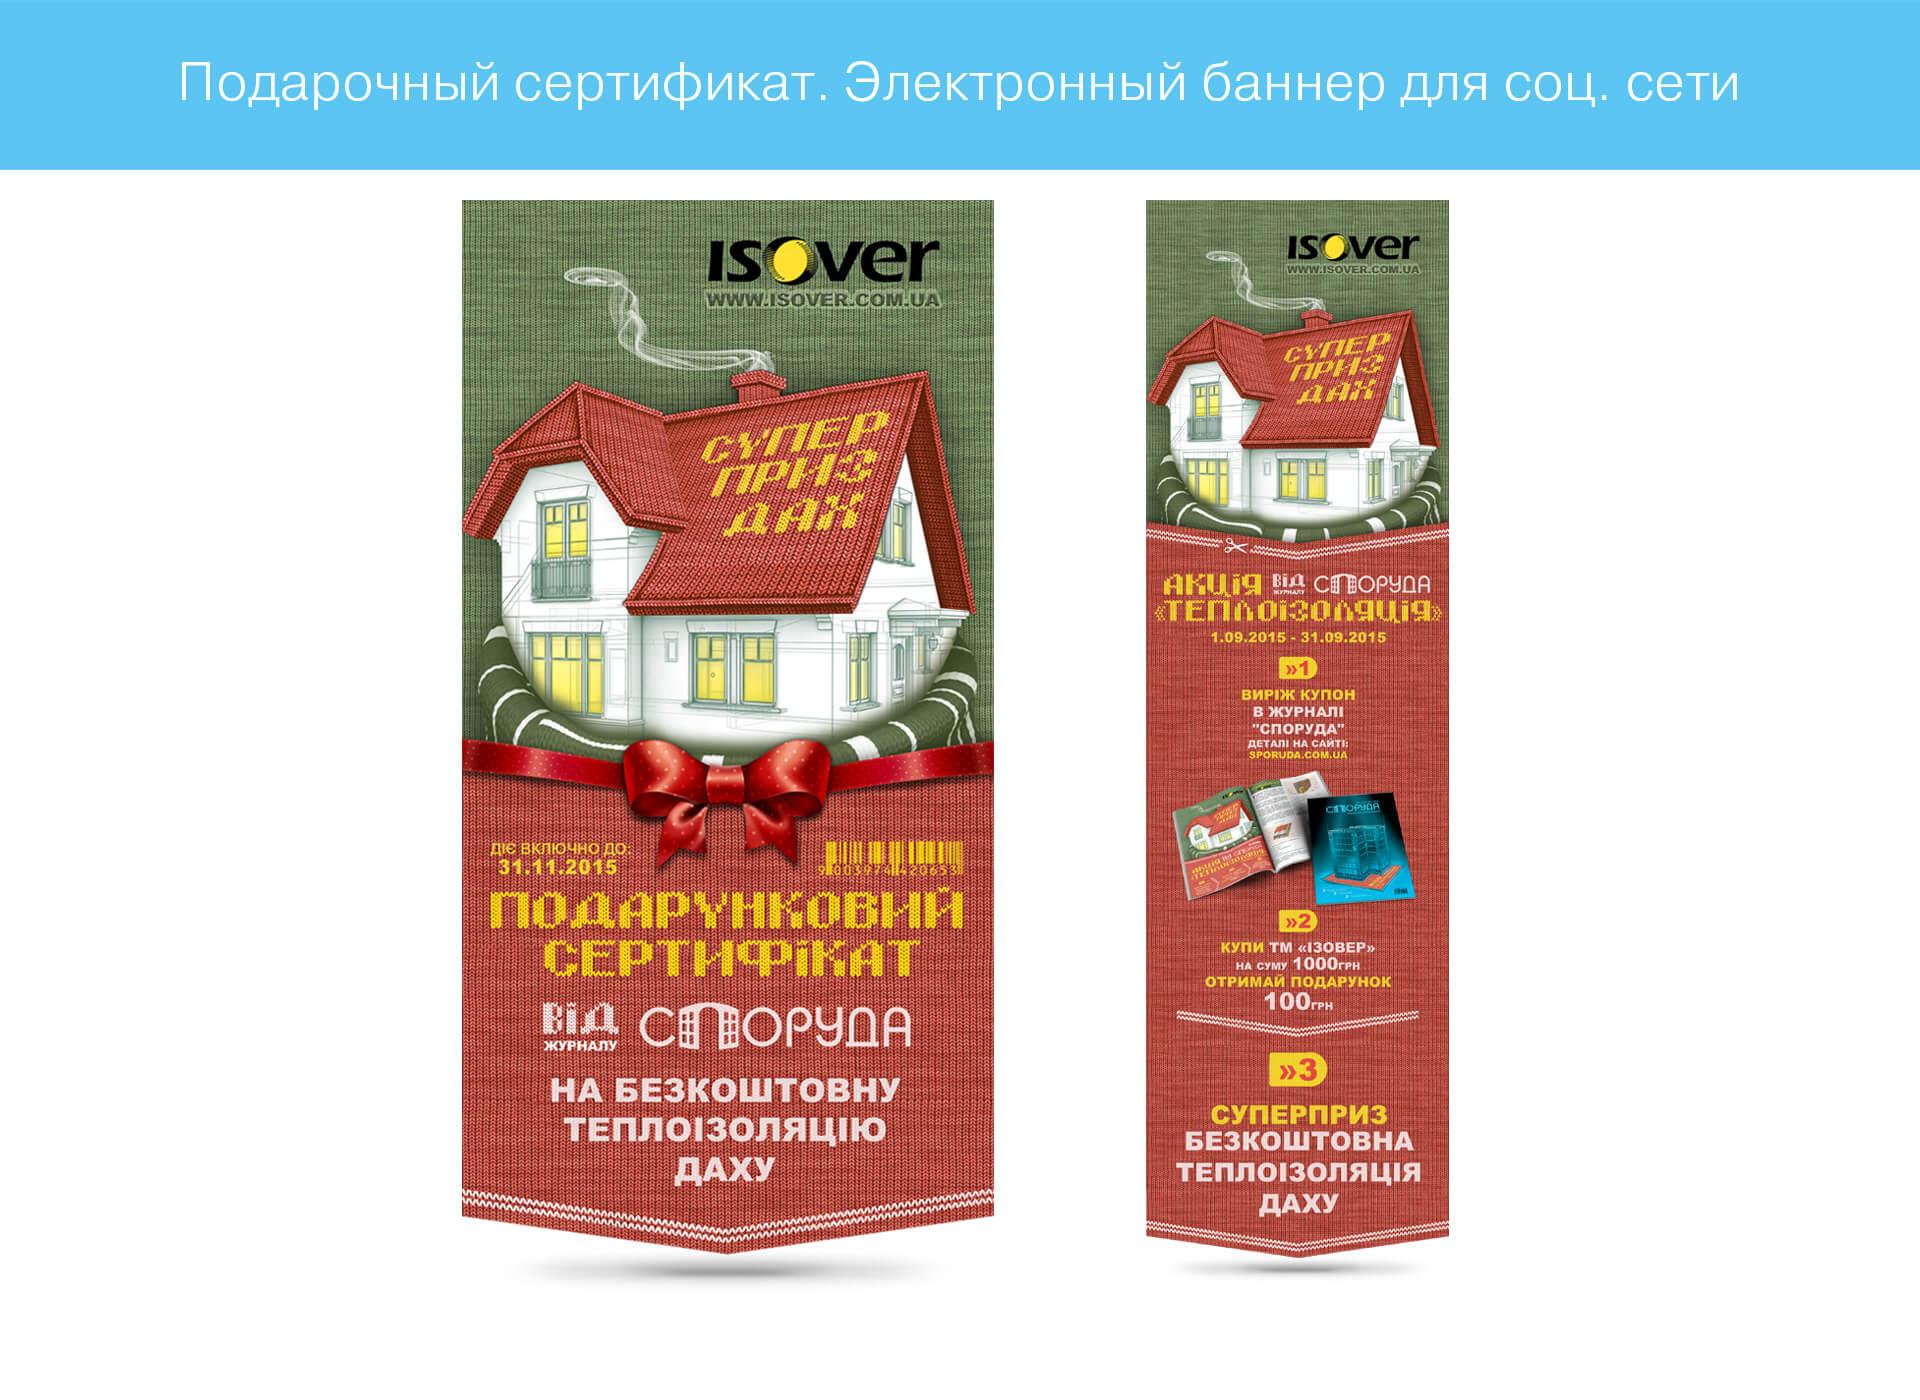 prokochuk_irina_architectural-magazine-sporuda_advertising-campaign_8